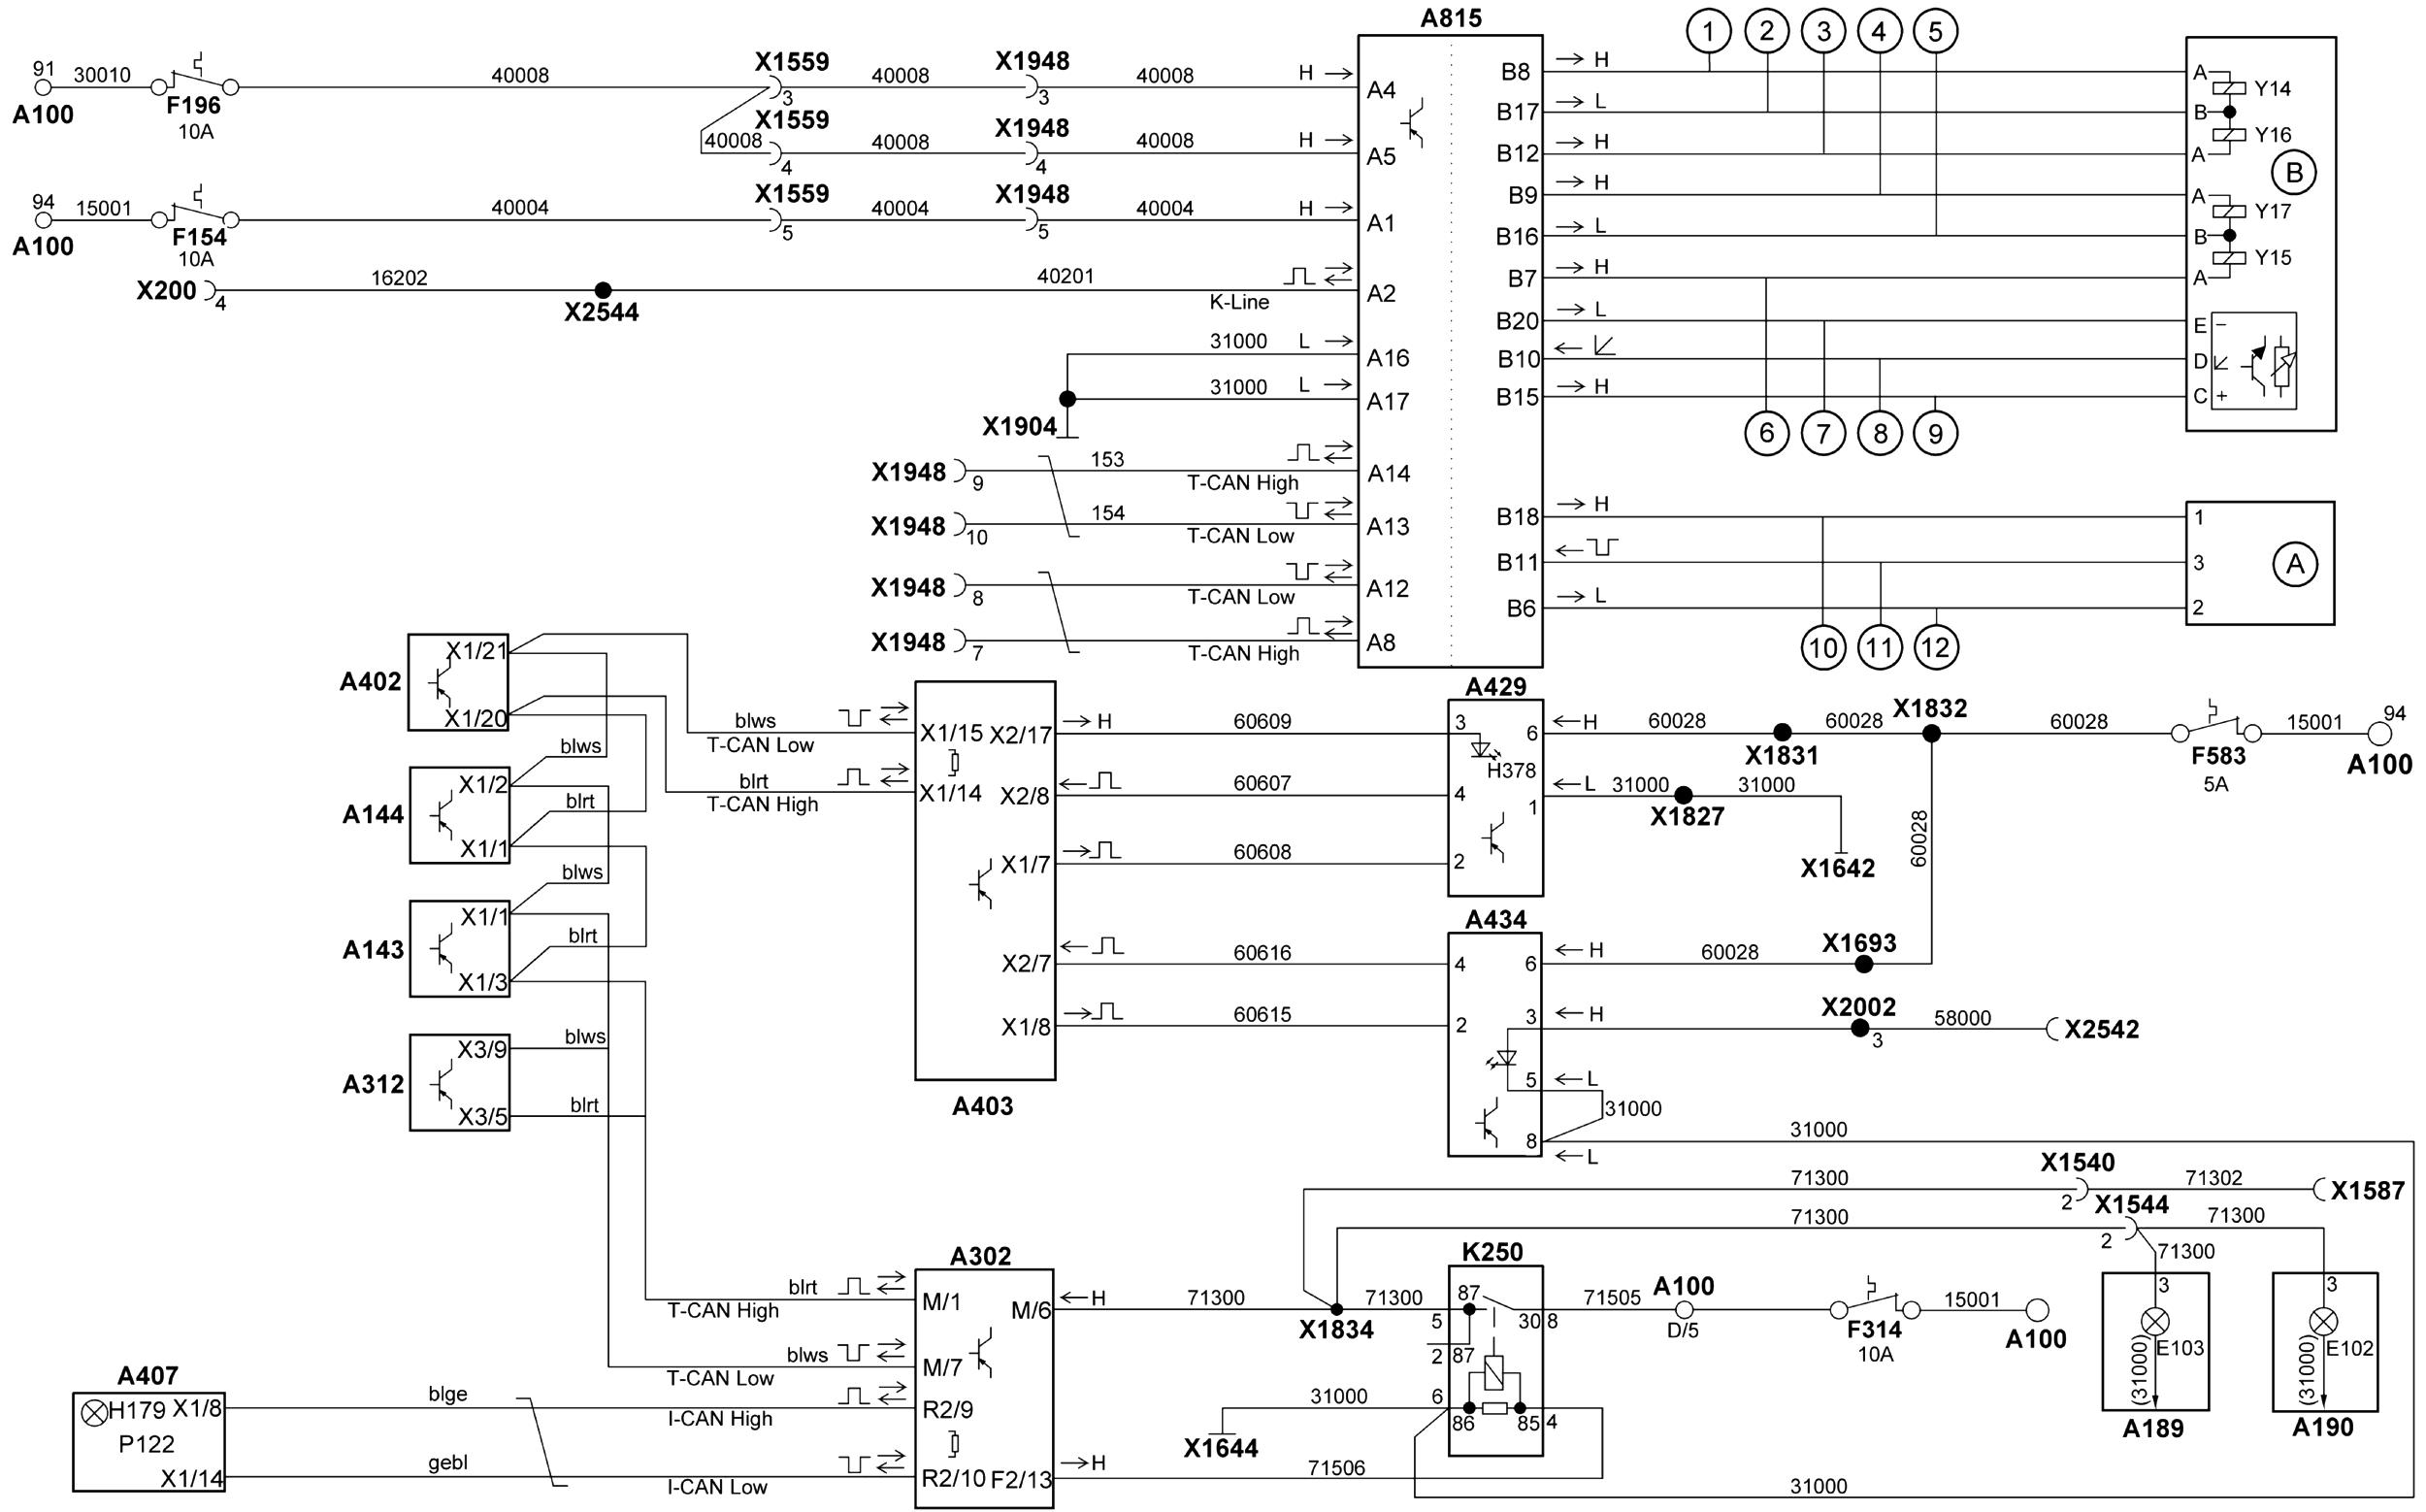 jcb 3cx 4ws sm электрическая схема